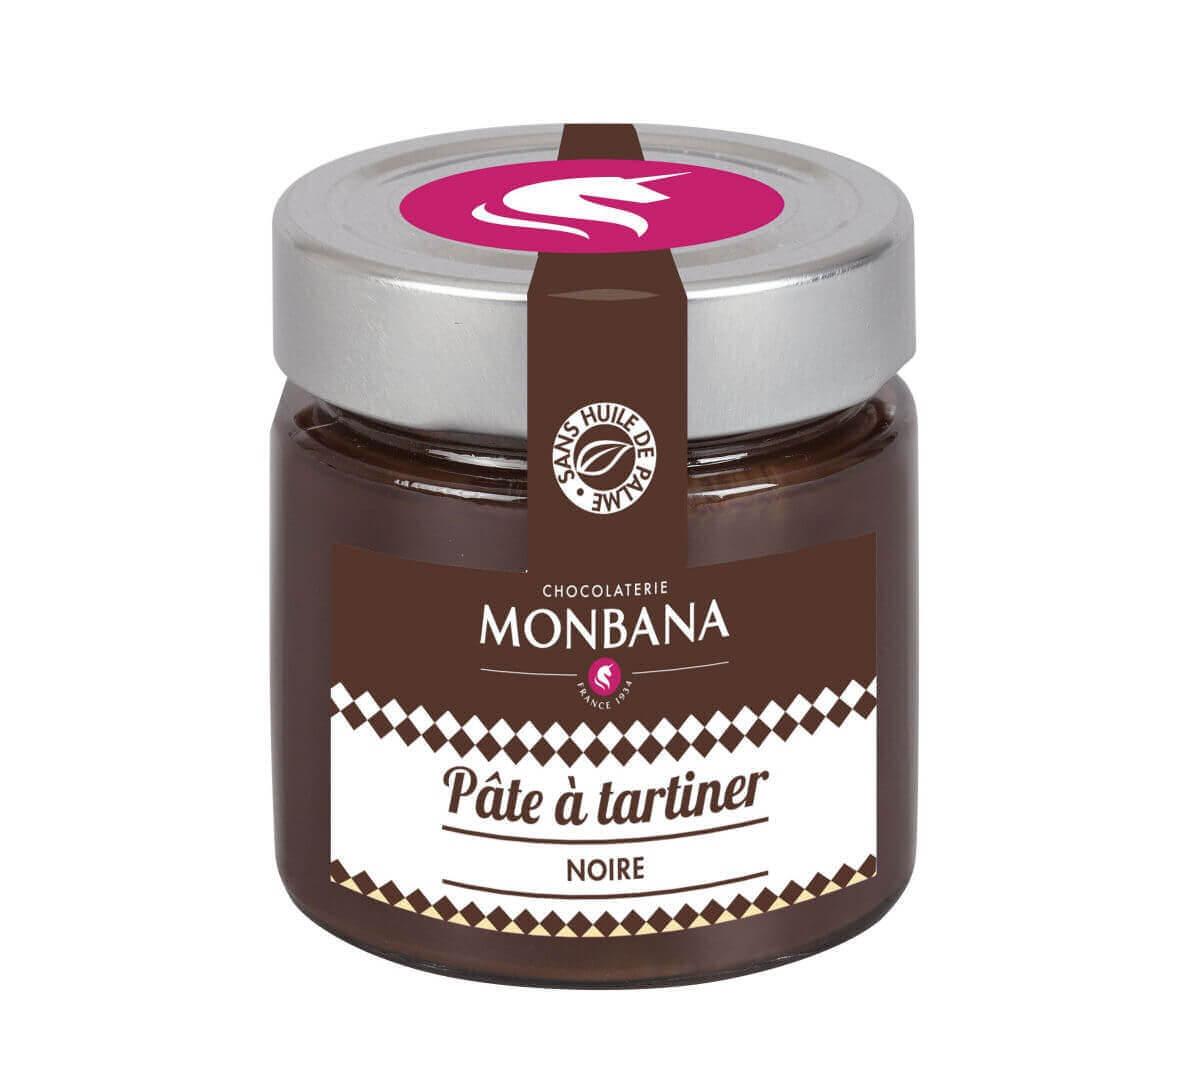 monbana pate tartiner chocolat 154041